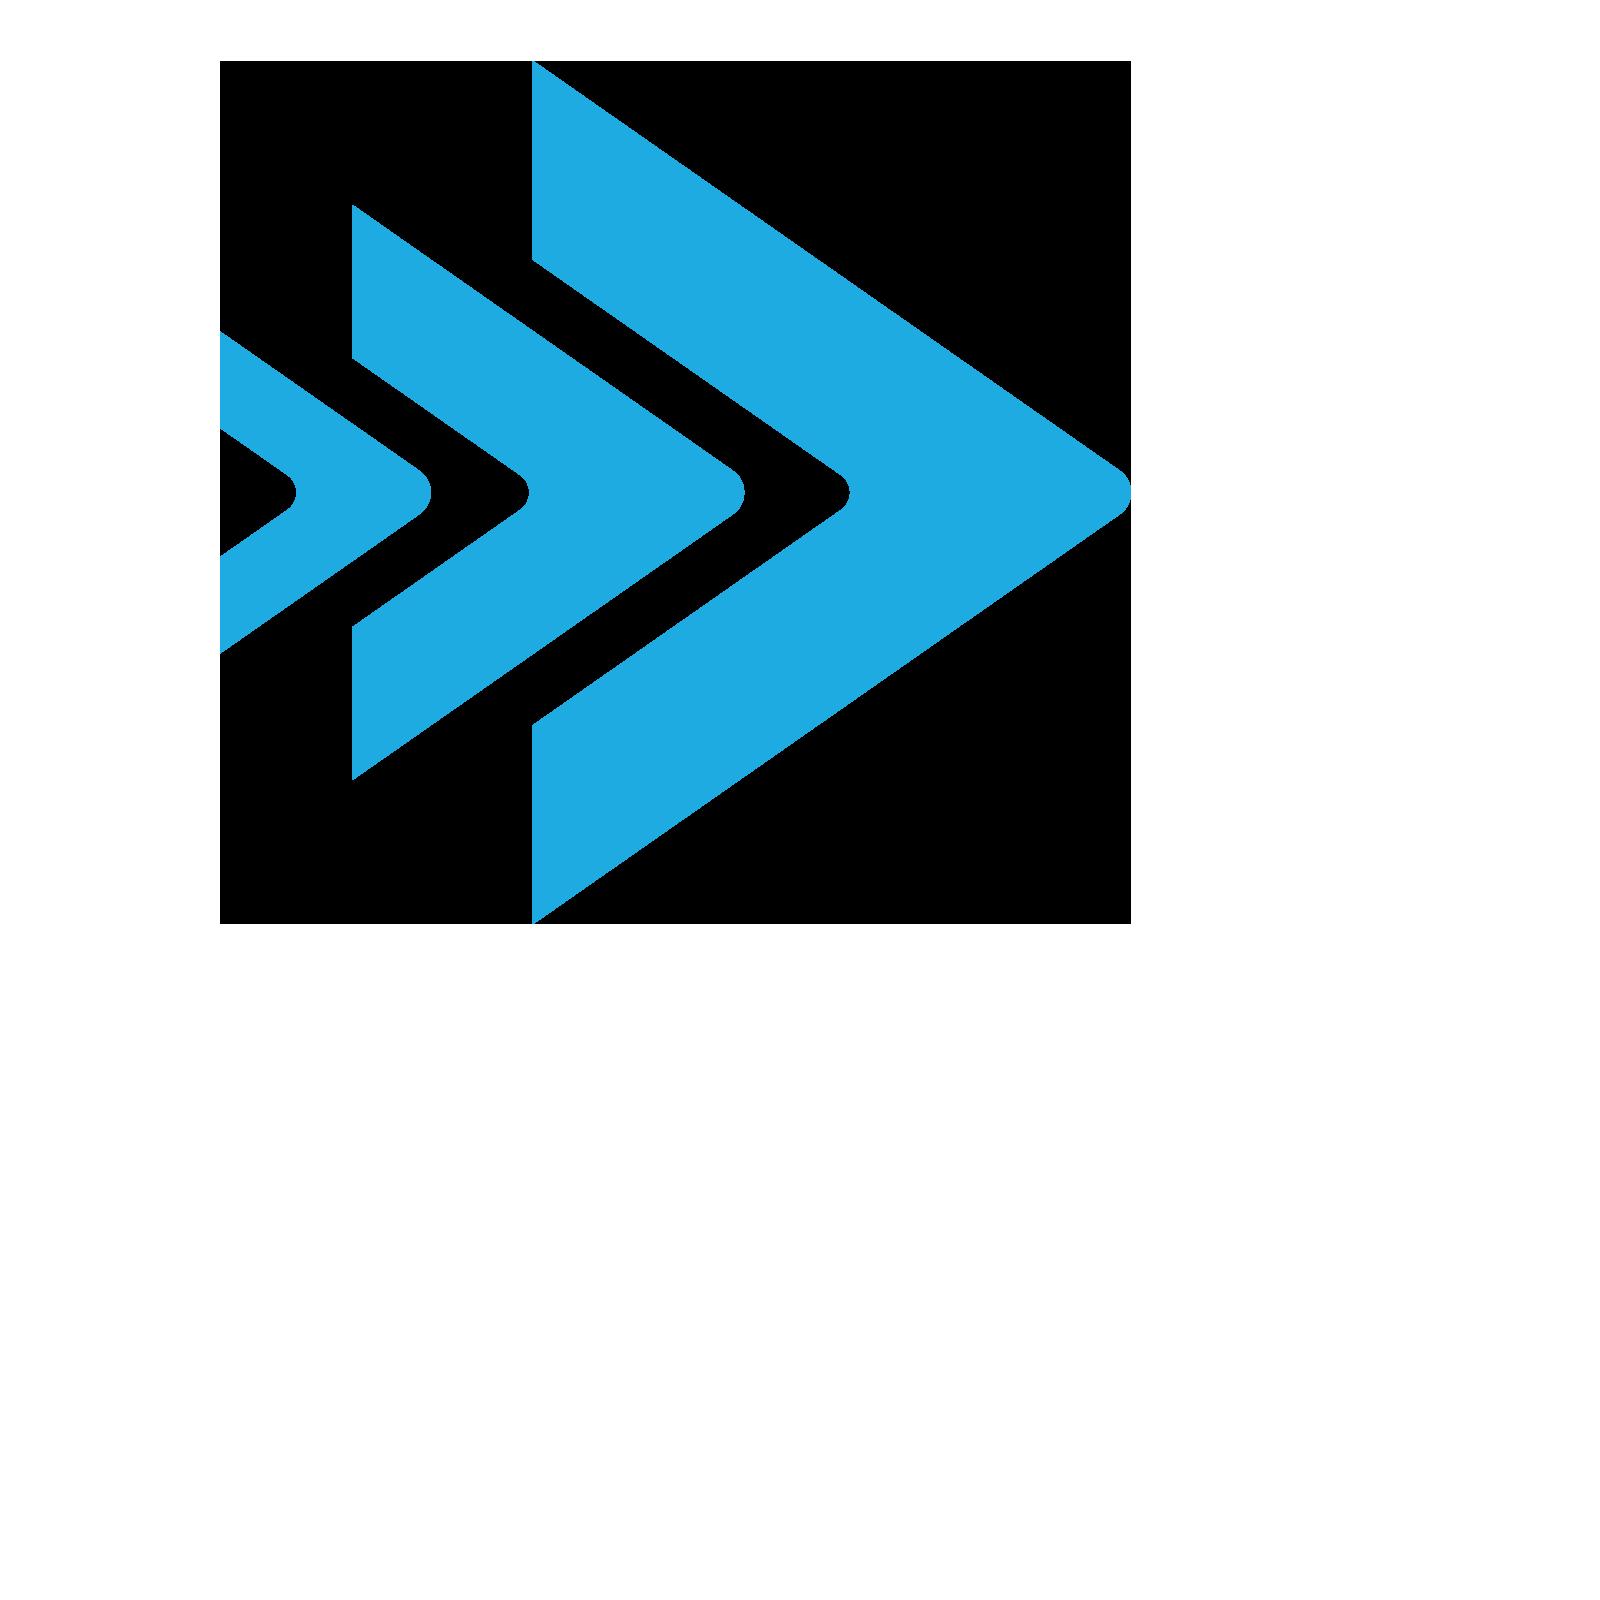 bitmovin-player-web-samples/index html at master · bitmovin